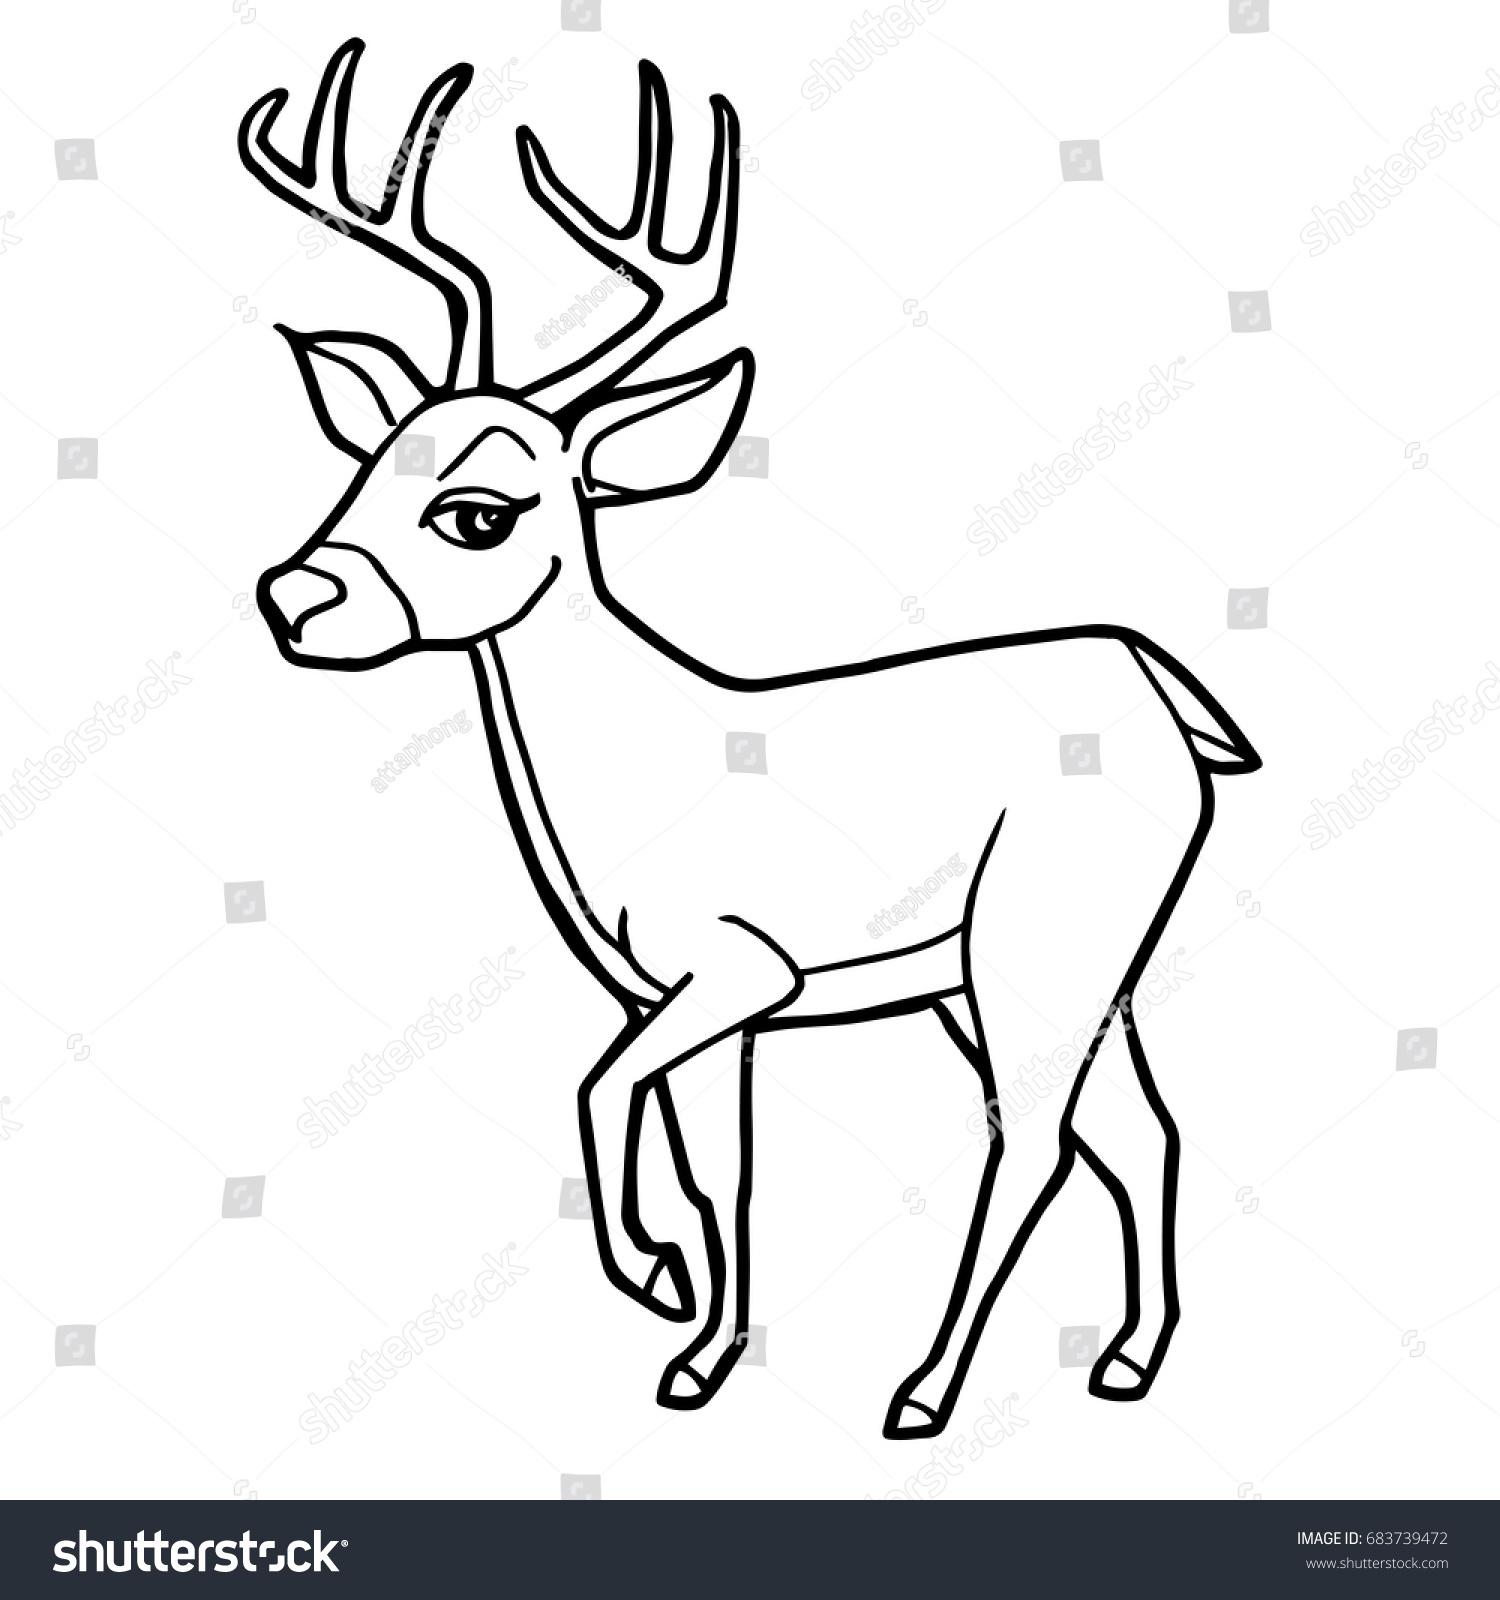 cartoon cute deer coloring page vector stock vector 683739472